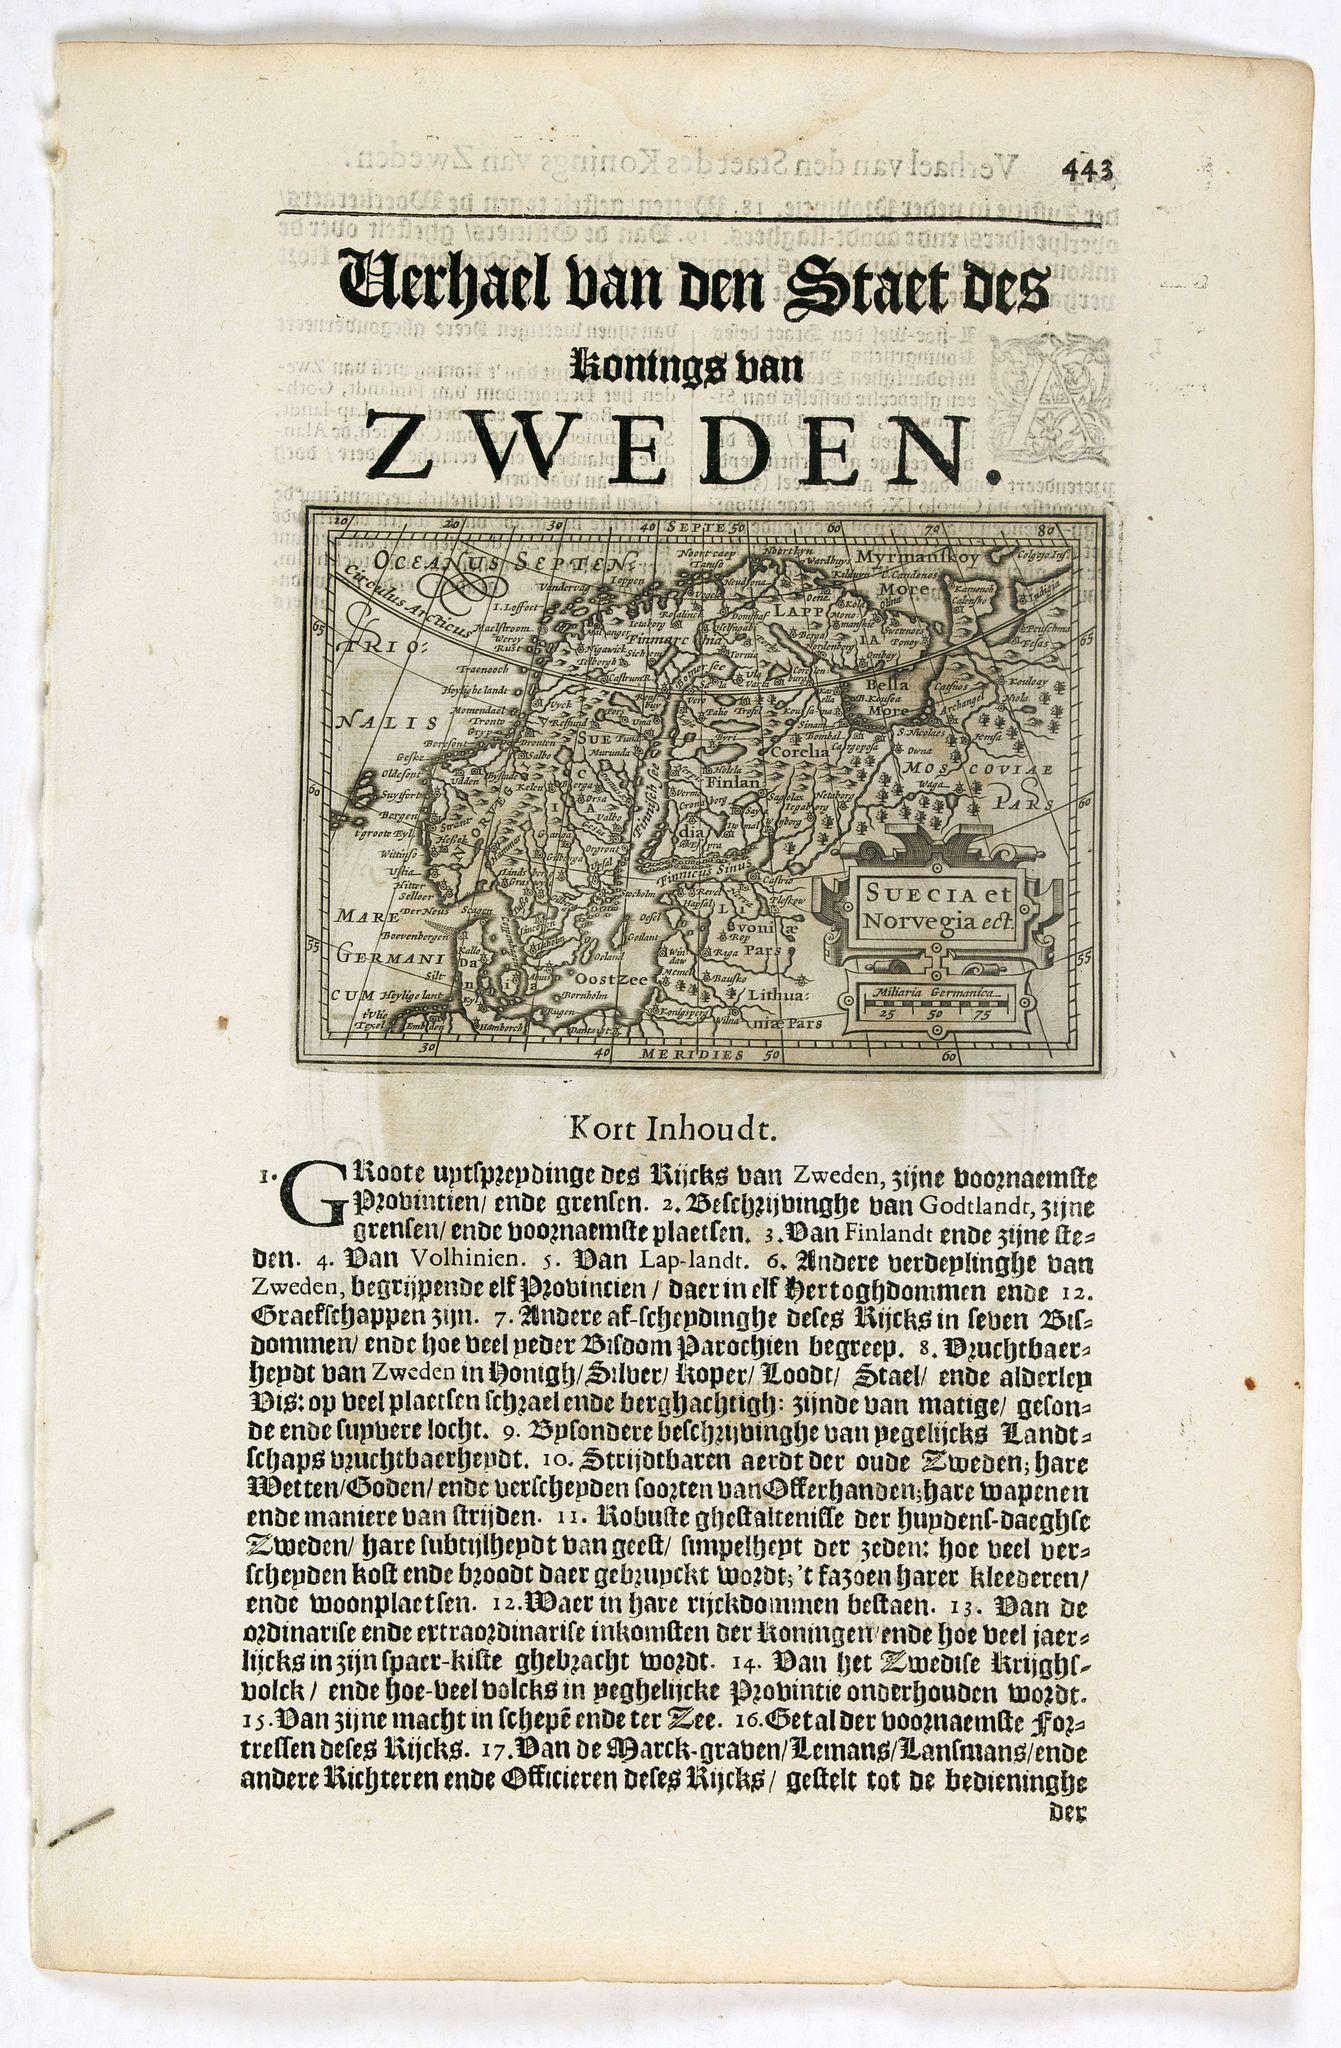 DE CLERCK, N. -  Suecia et Norvegia ect.